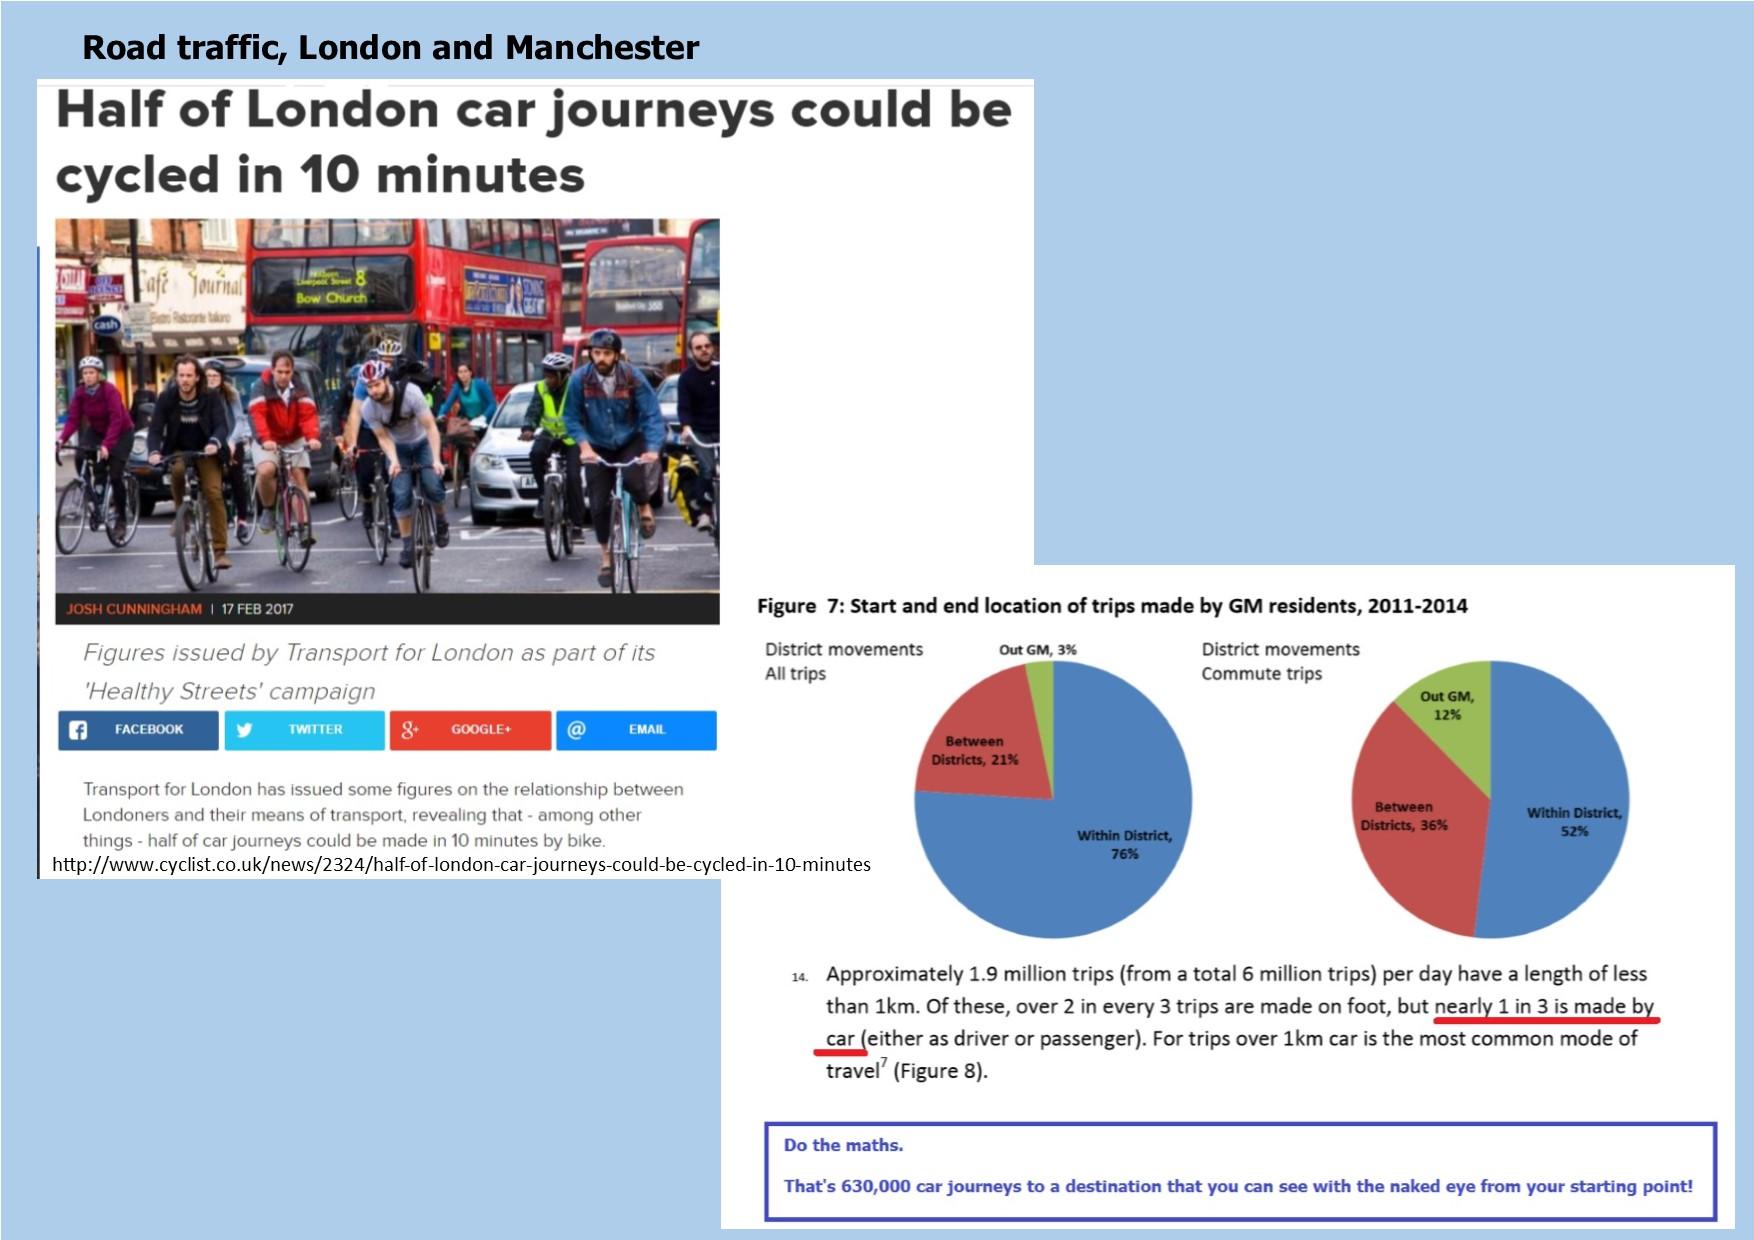 LondonAndManchester.jpg